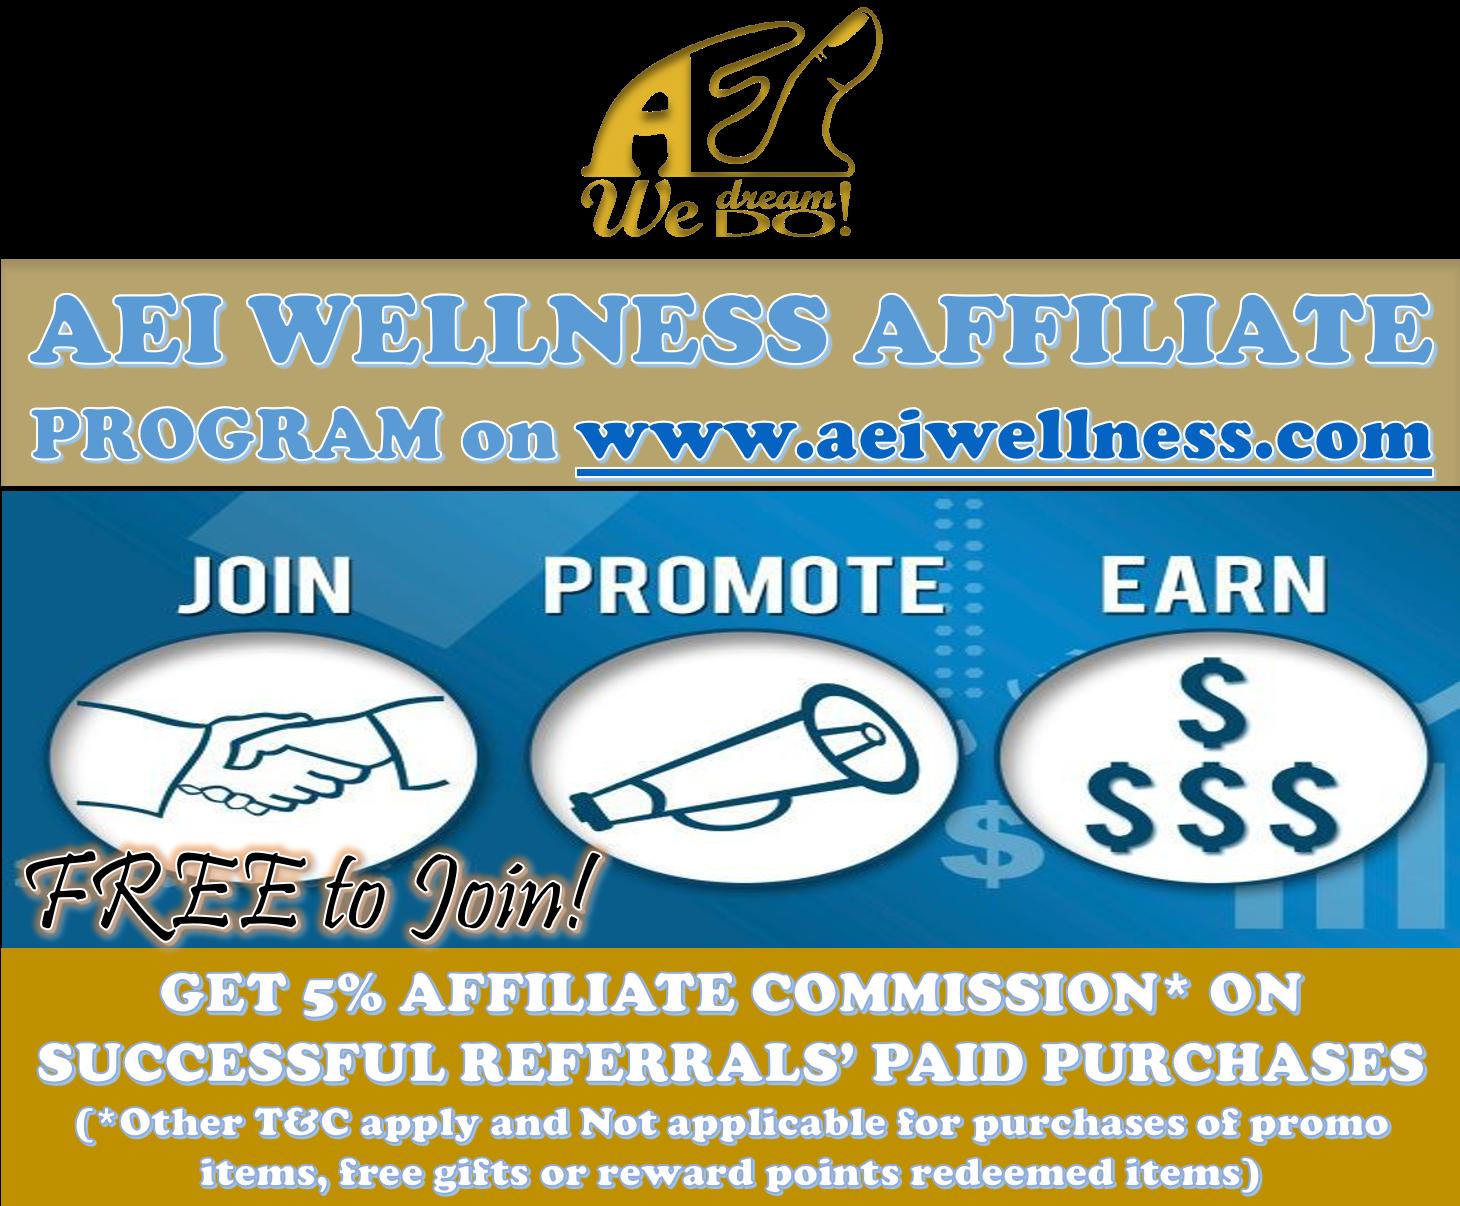 AEI Wellness Affiliate Program